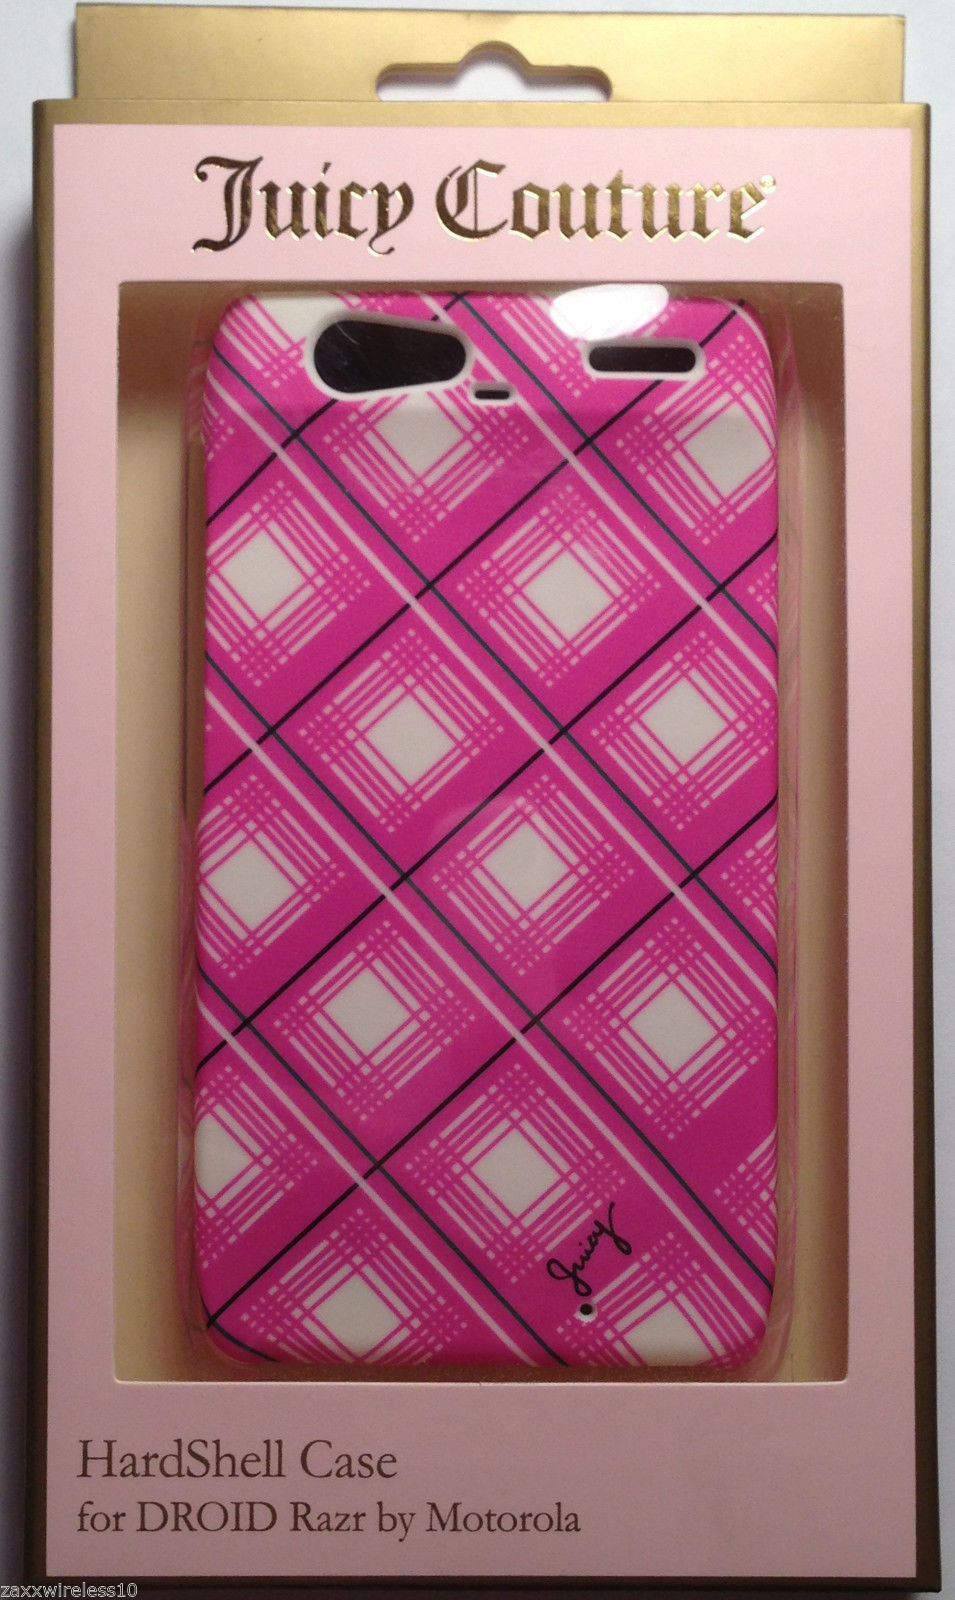 Juicy Couture Hardshell Case for Motorola Droid Razr XT912 - Pink